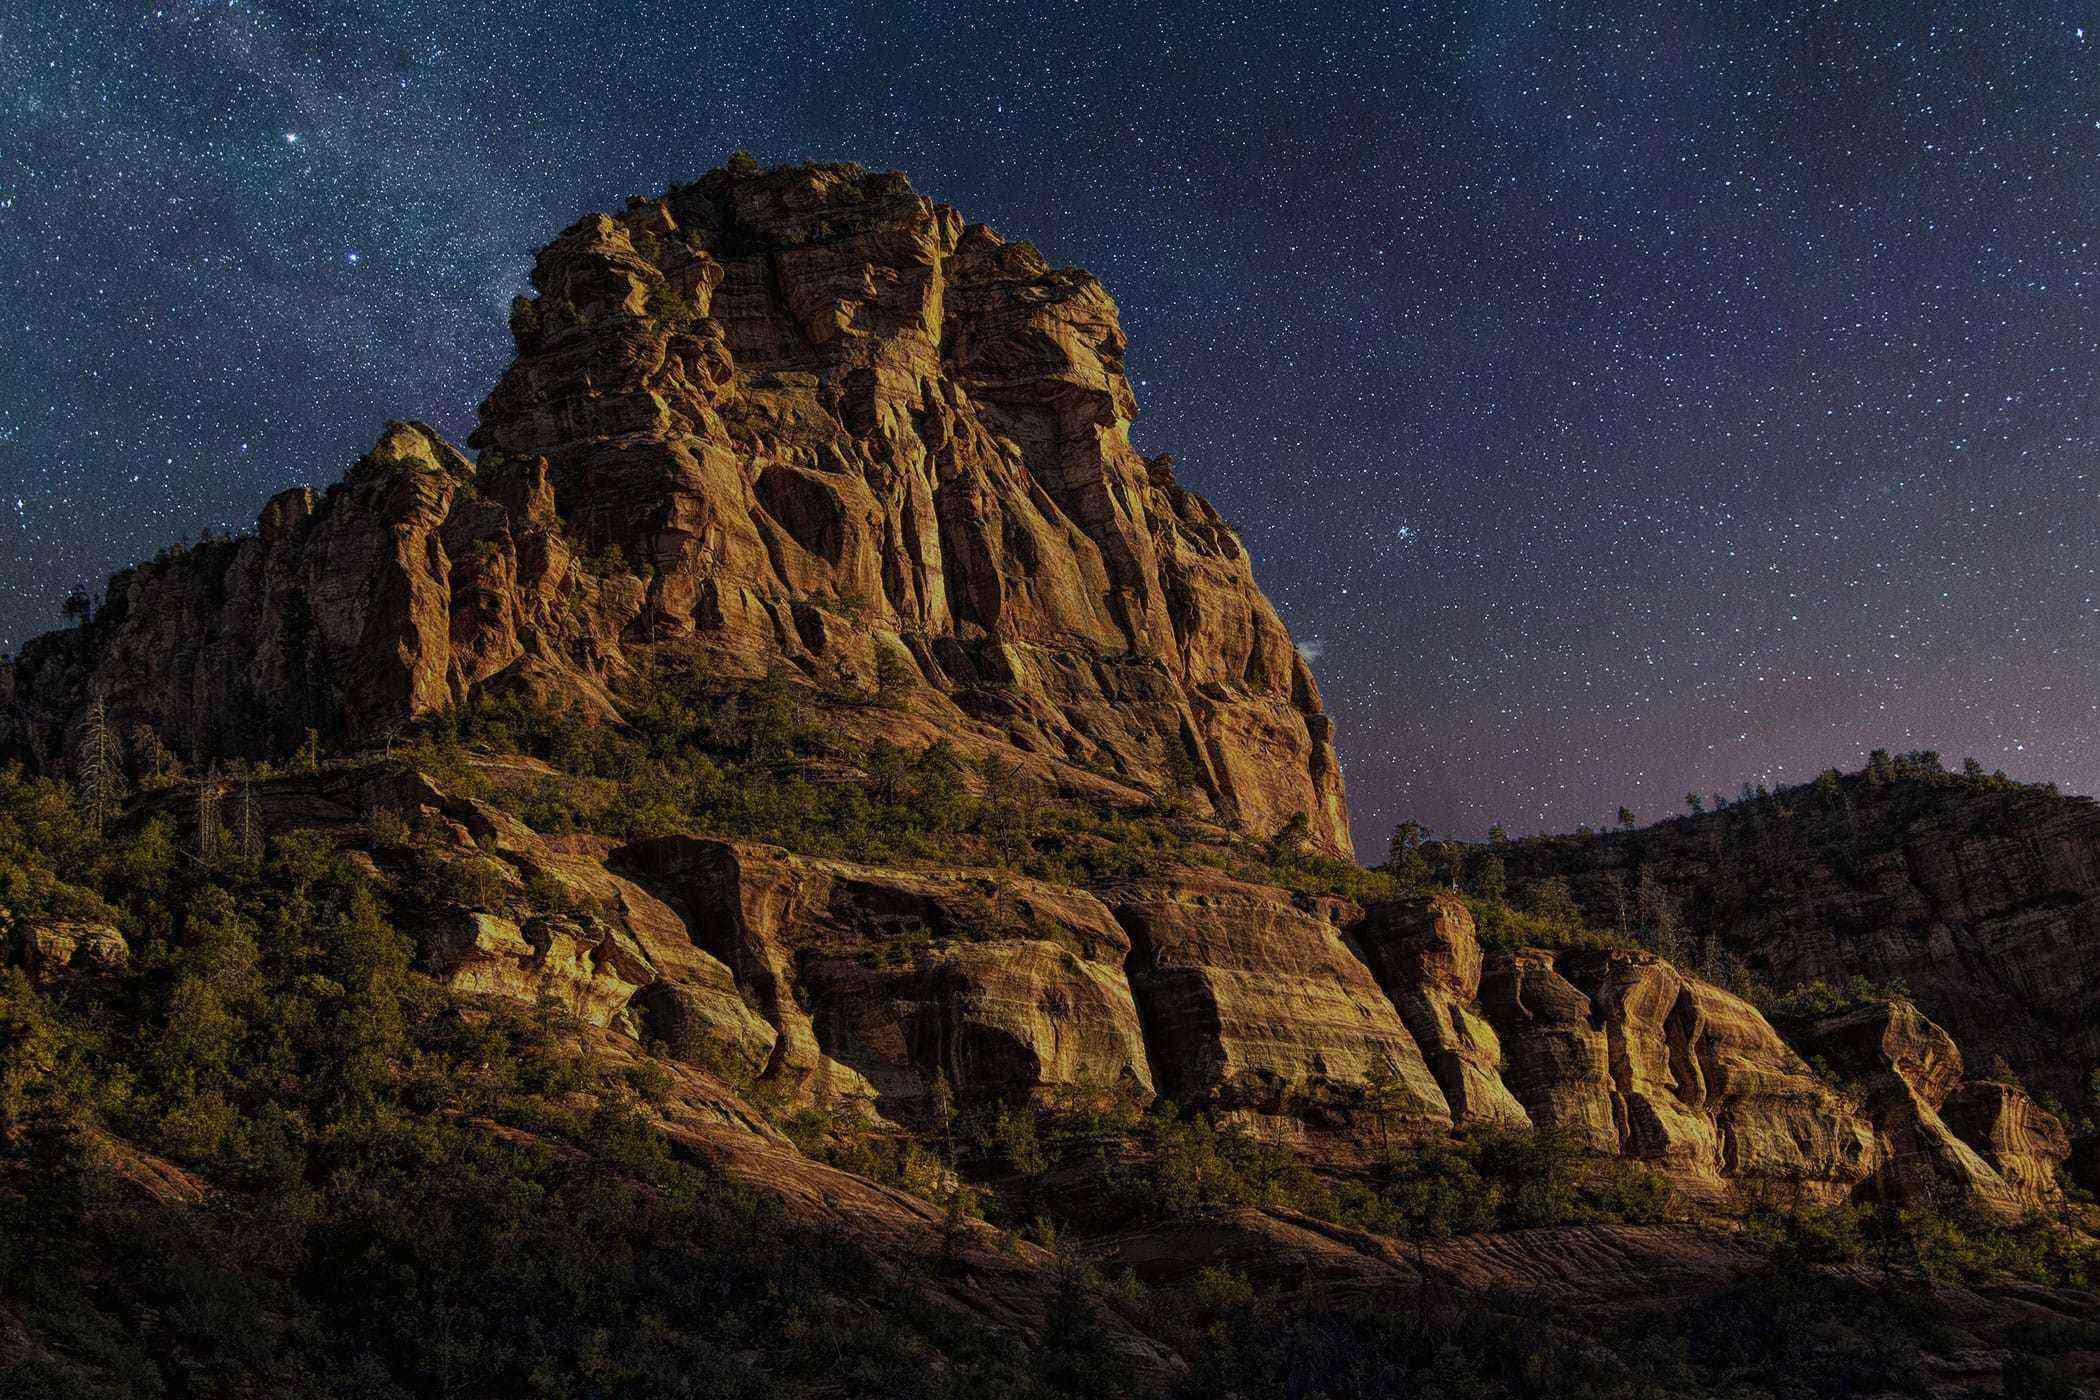 Comet Neowise soars across the night sky in the desert